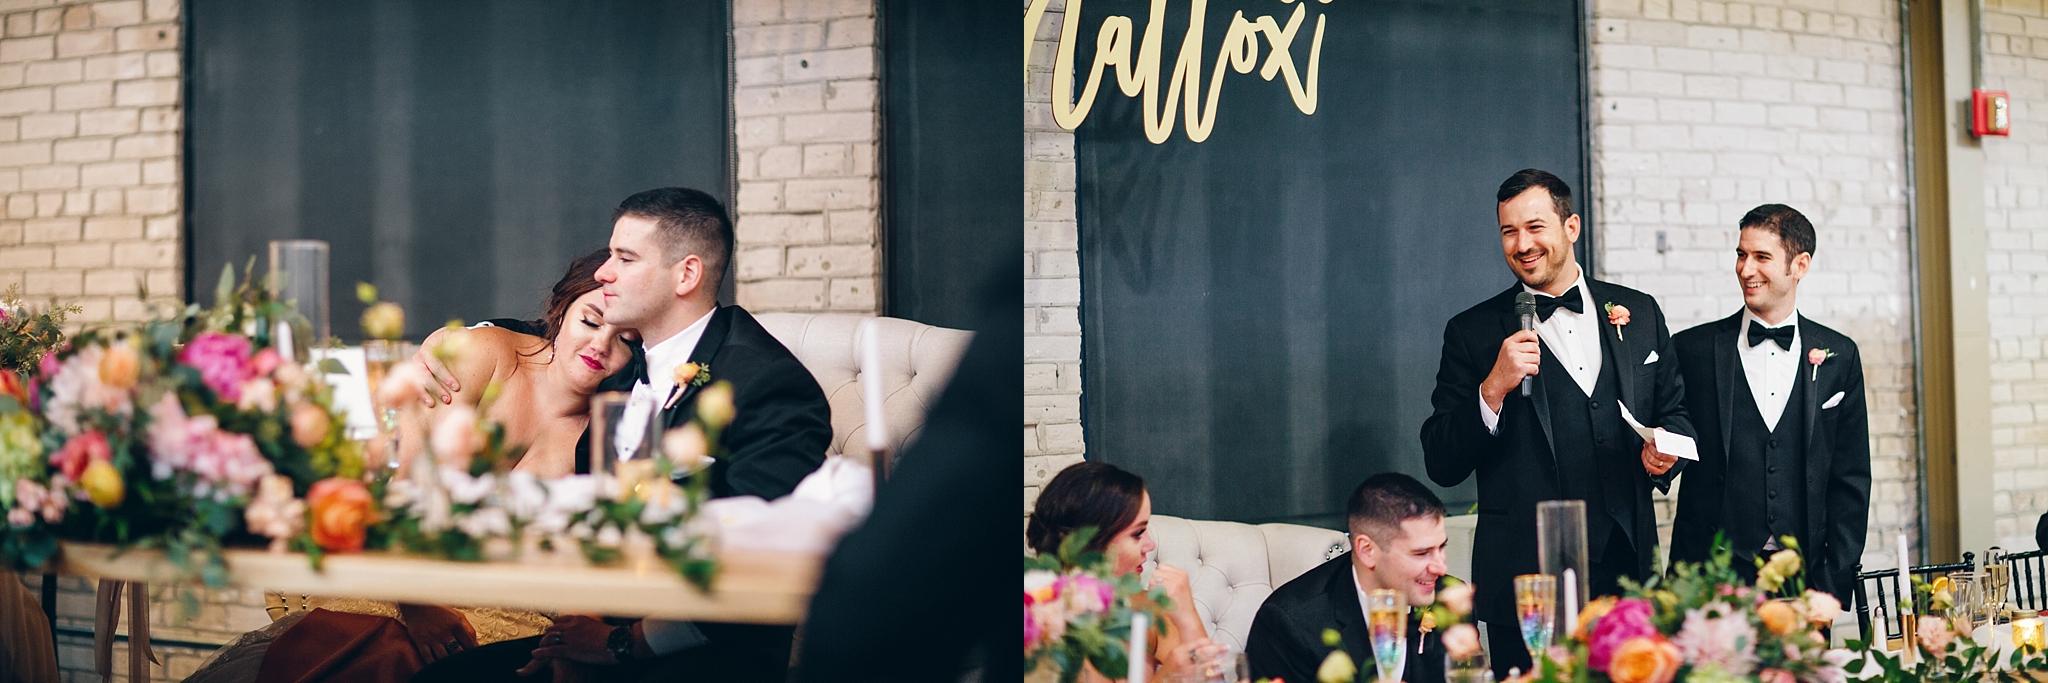 baker-lofts-holland-michigan-wedding-photographer_0391.jpg